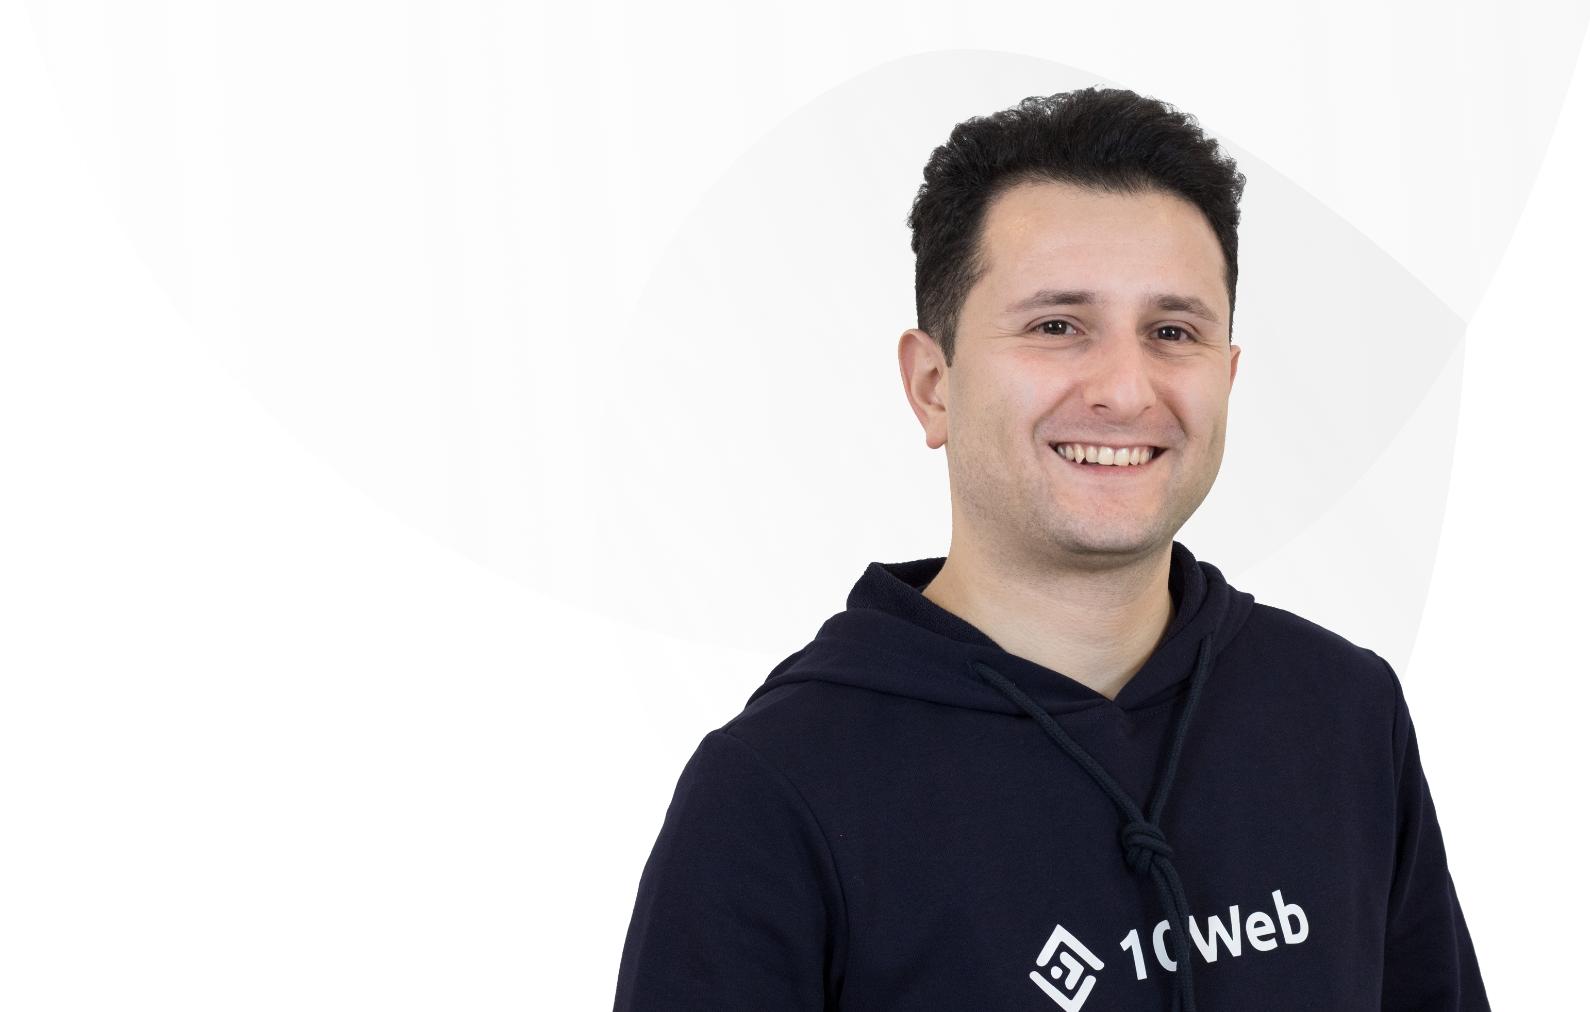 The 10Web Team